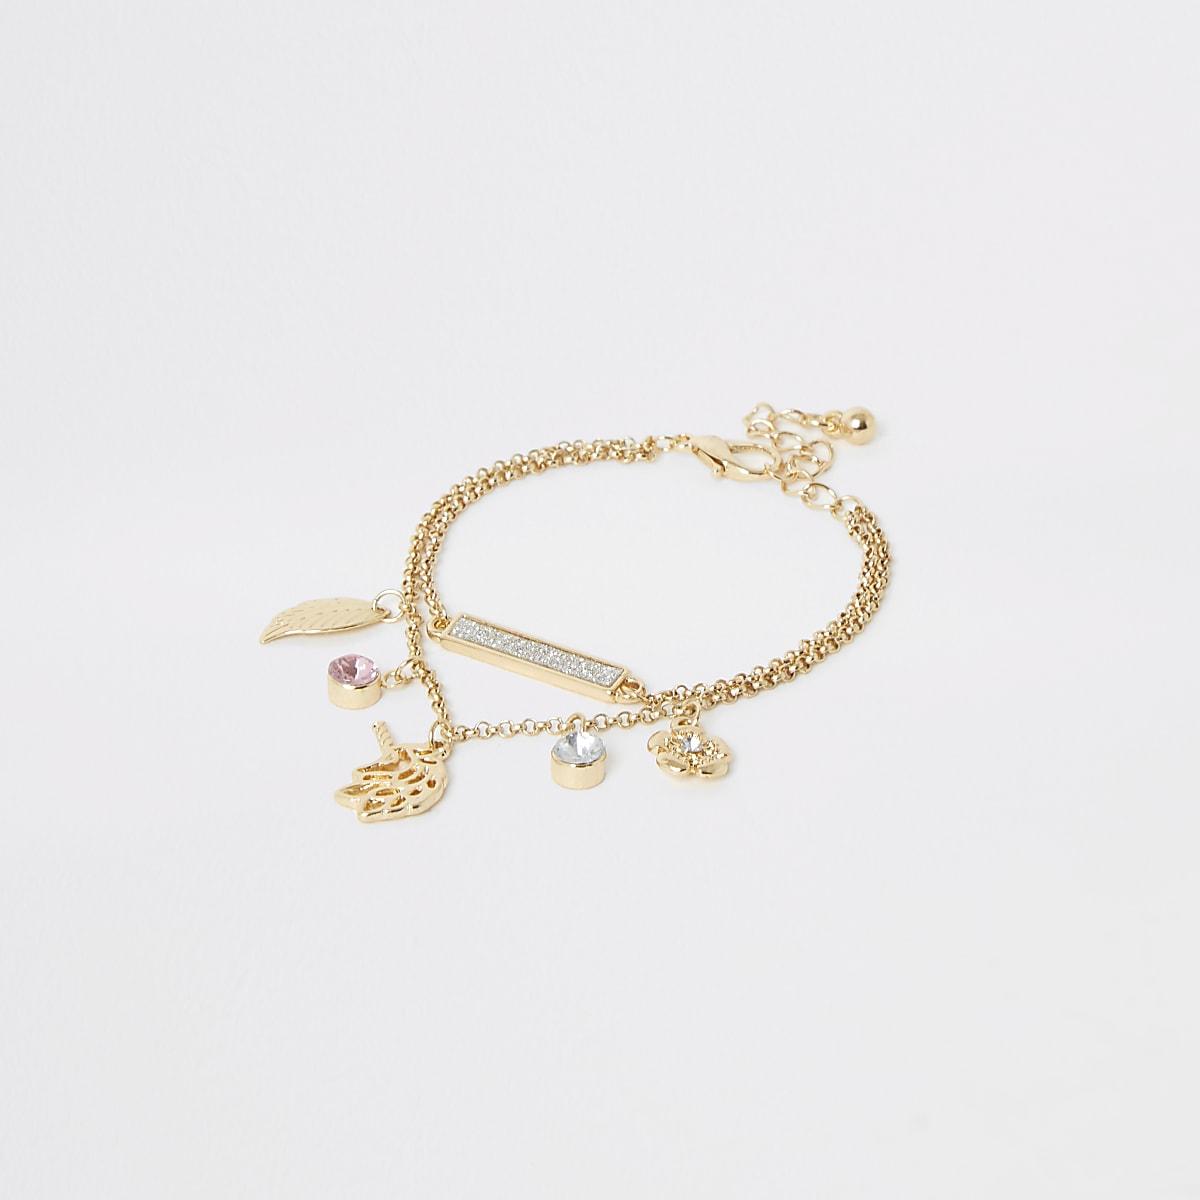 Girls gold color unicorn charm bracelet